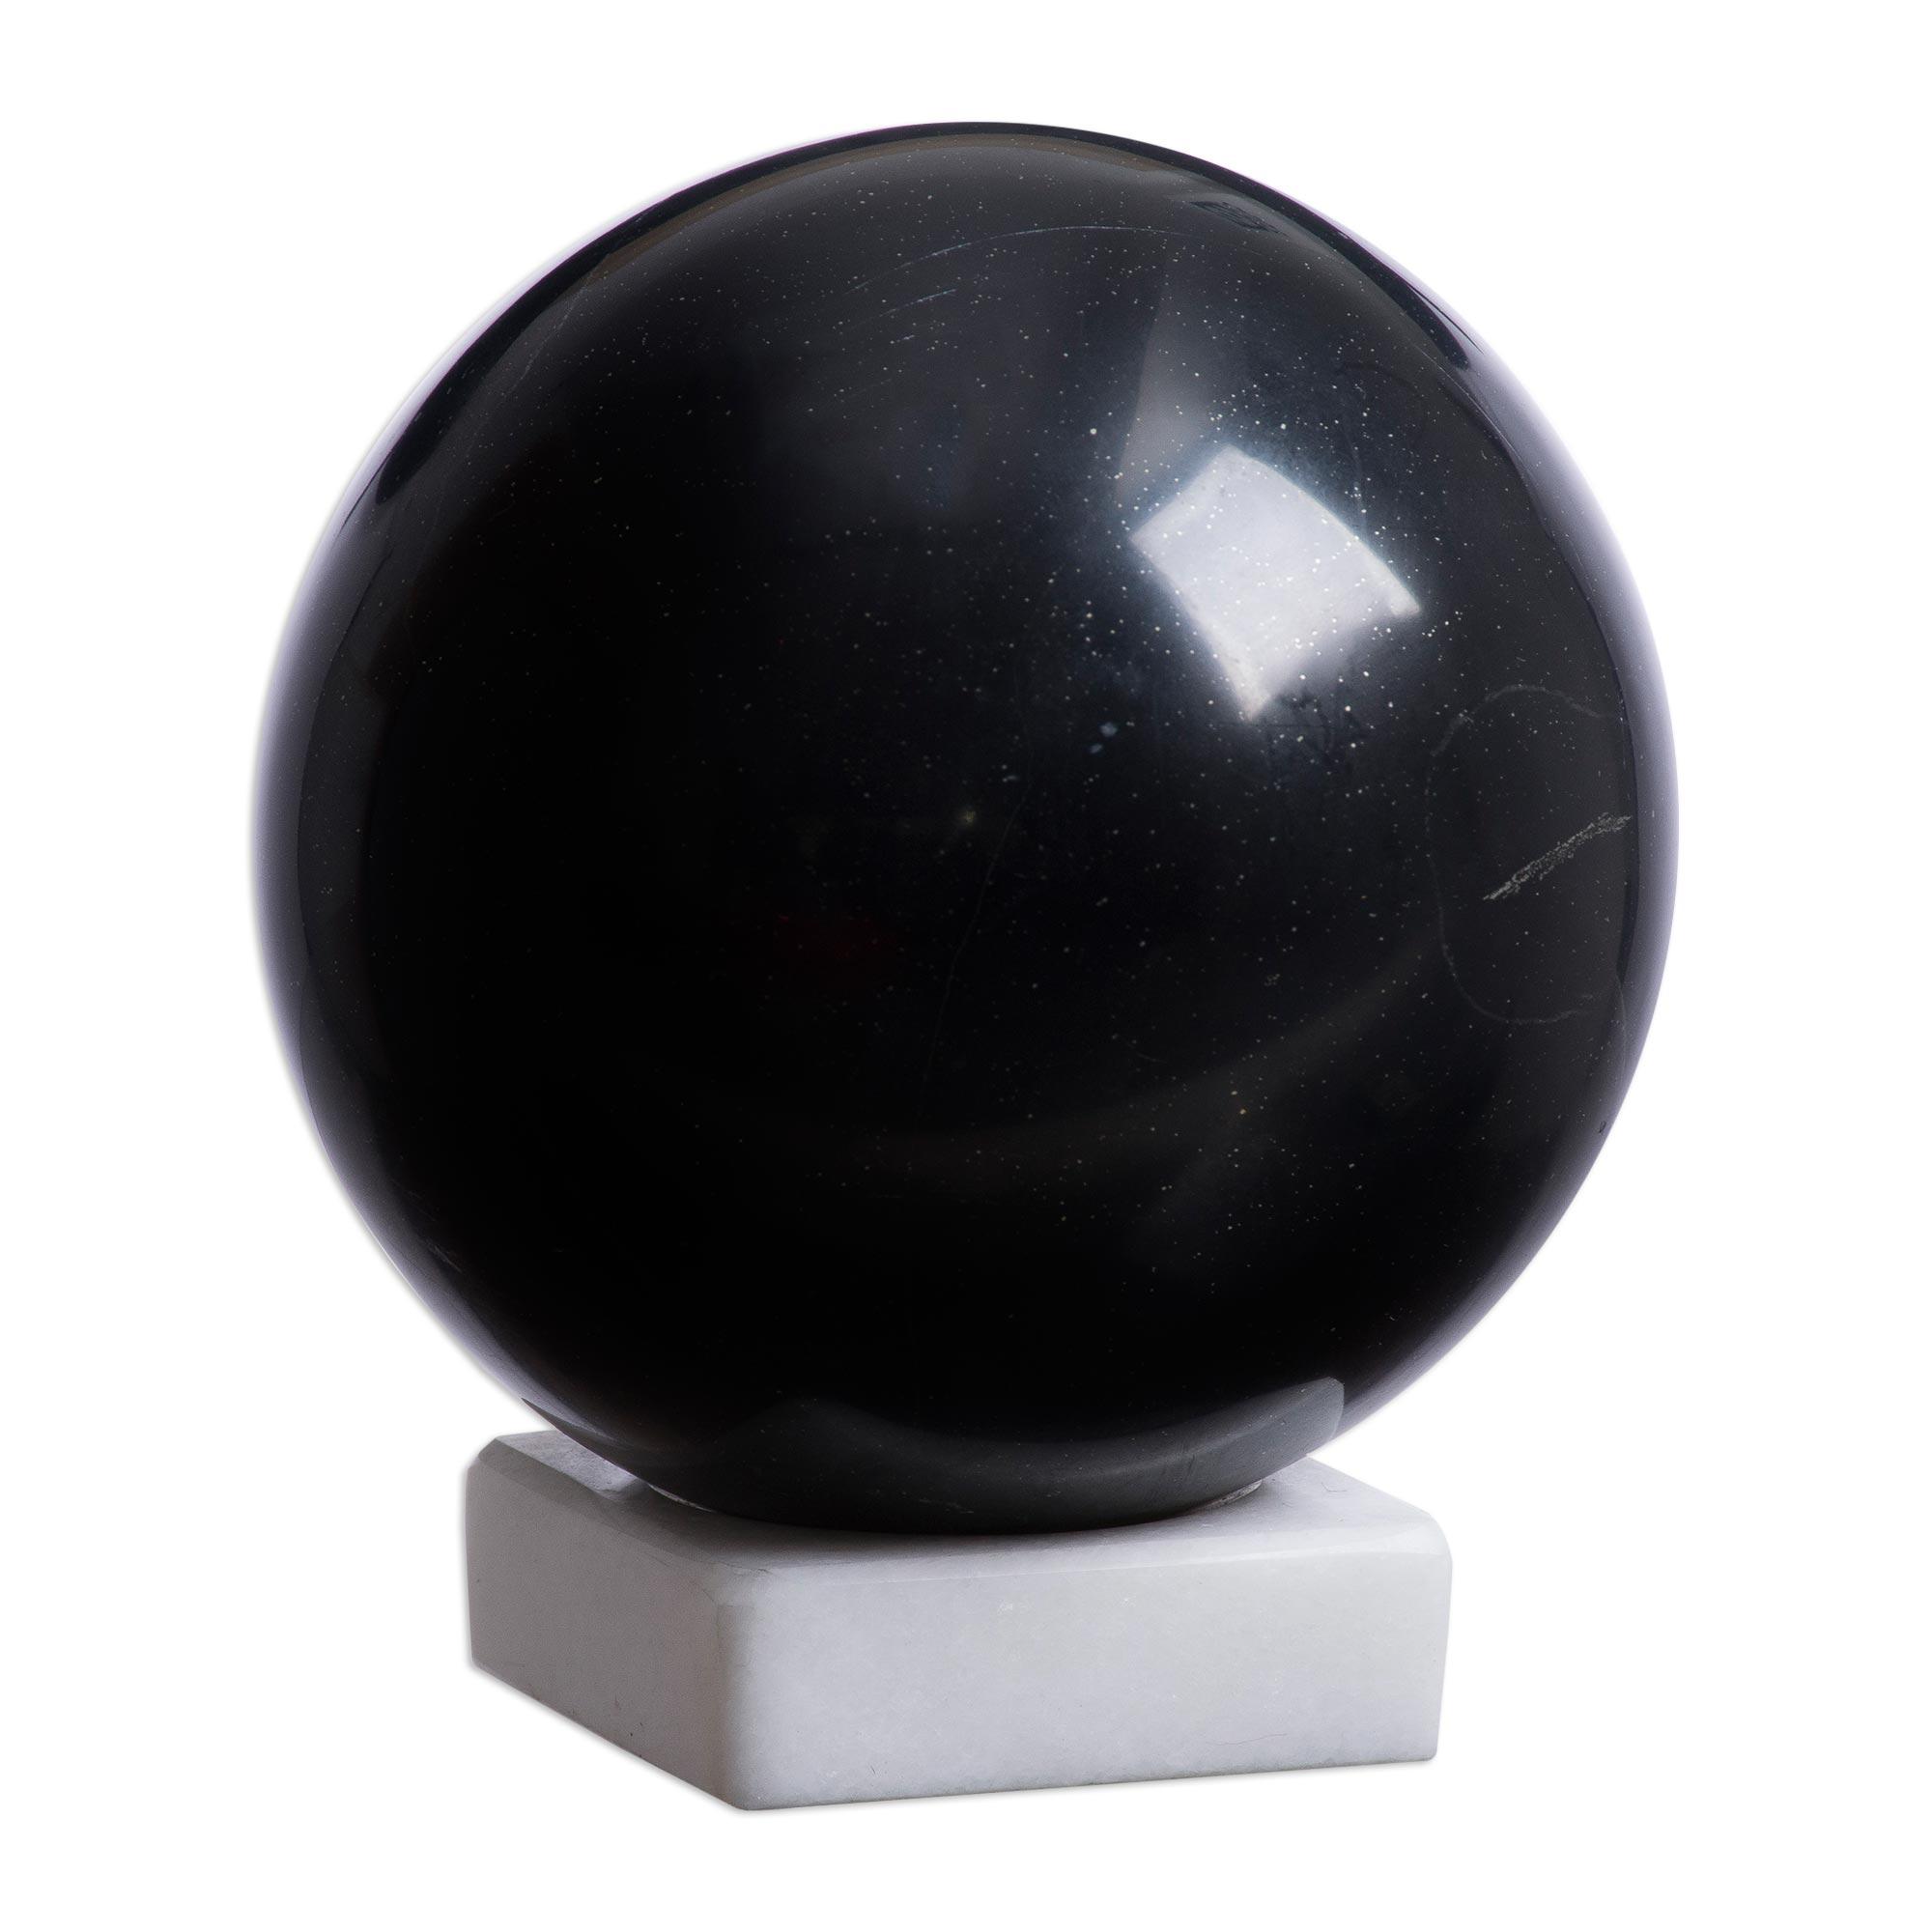 UNICEF Market   Peruvian Onyx Sphere Sculpture - Black Hole